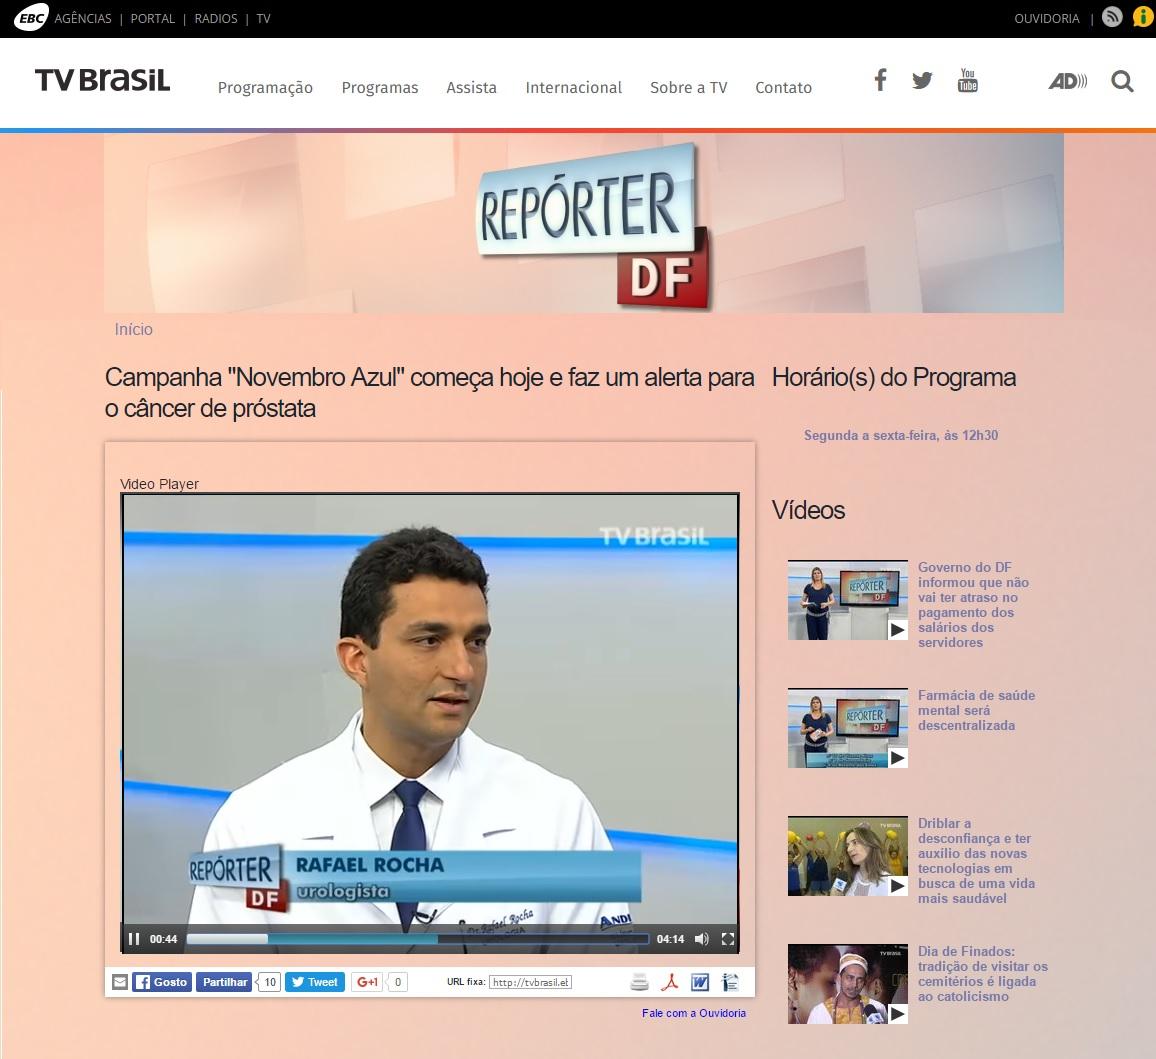 tv-brasil-reporter-df-dr-rafael-rocha-hsl-03-11-2016